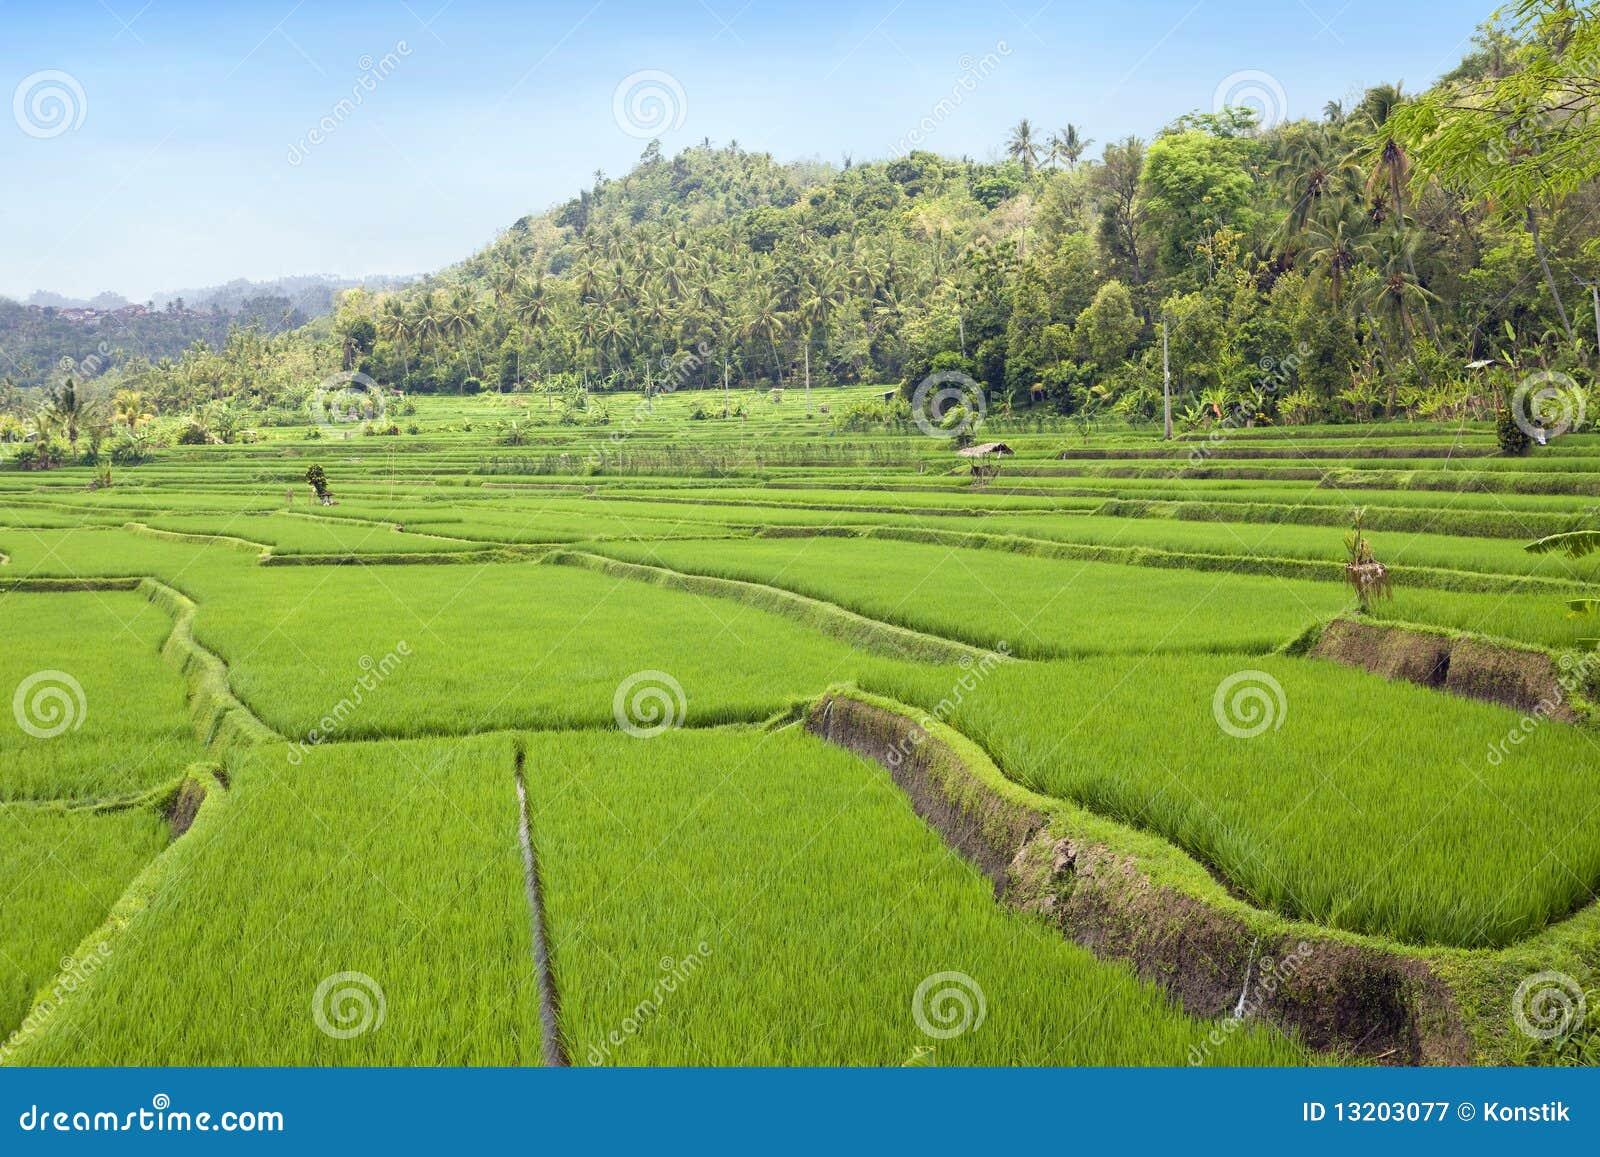 Kind on rice terraces, Bali, Indonesia